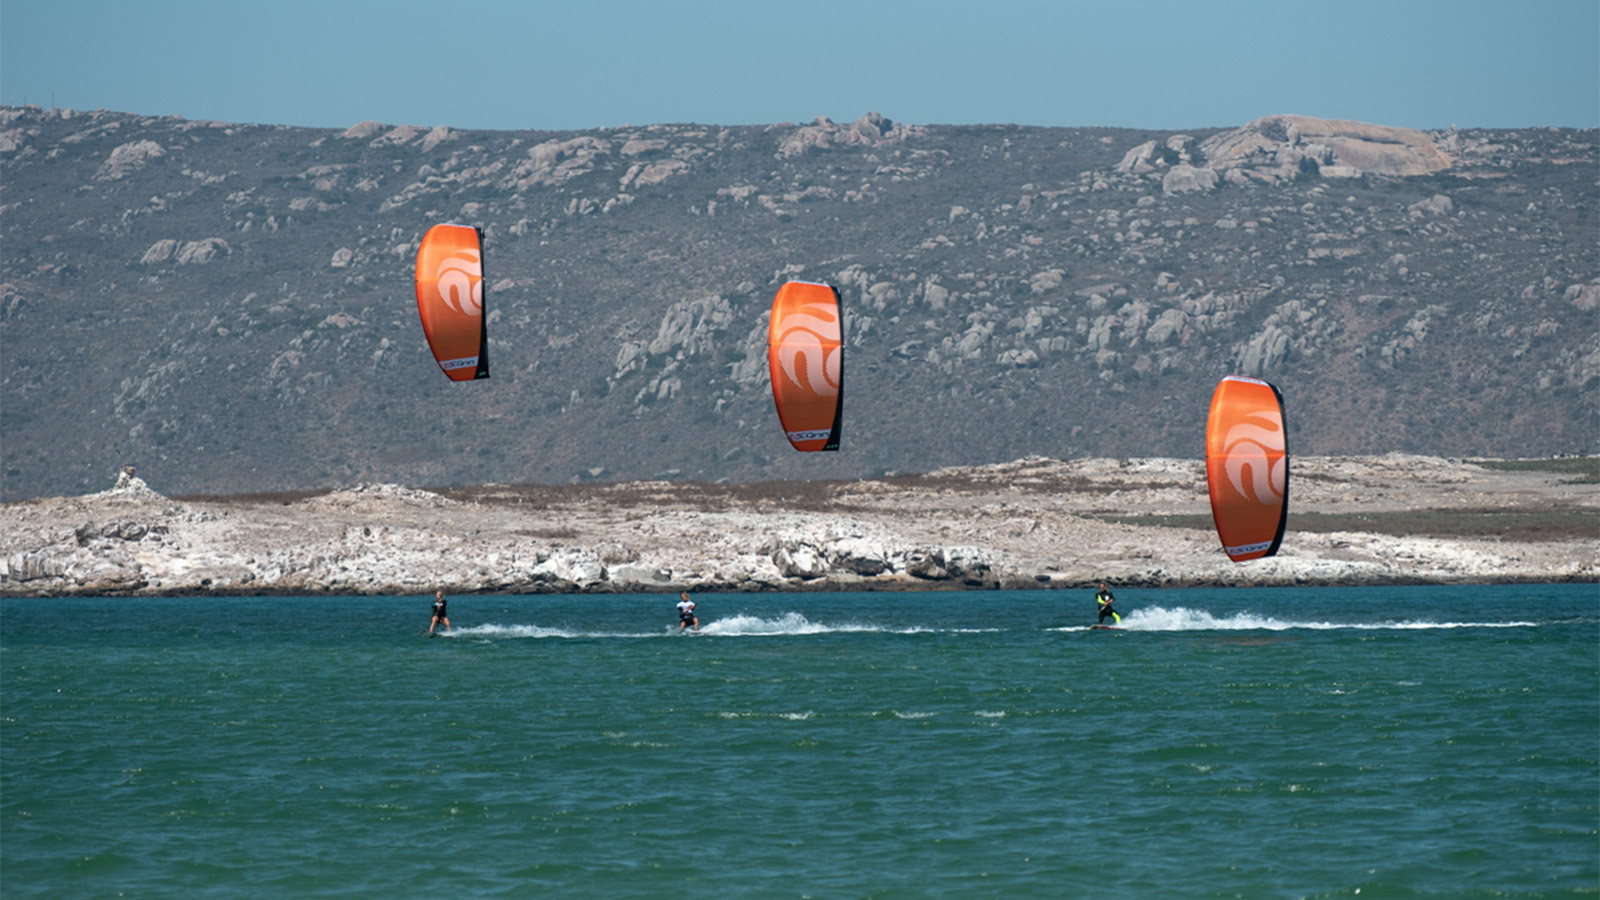 Peter Lynn Kiteboarding 2020 Kites